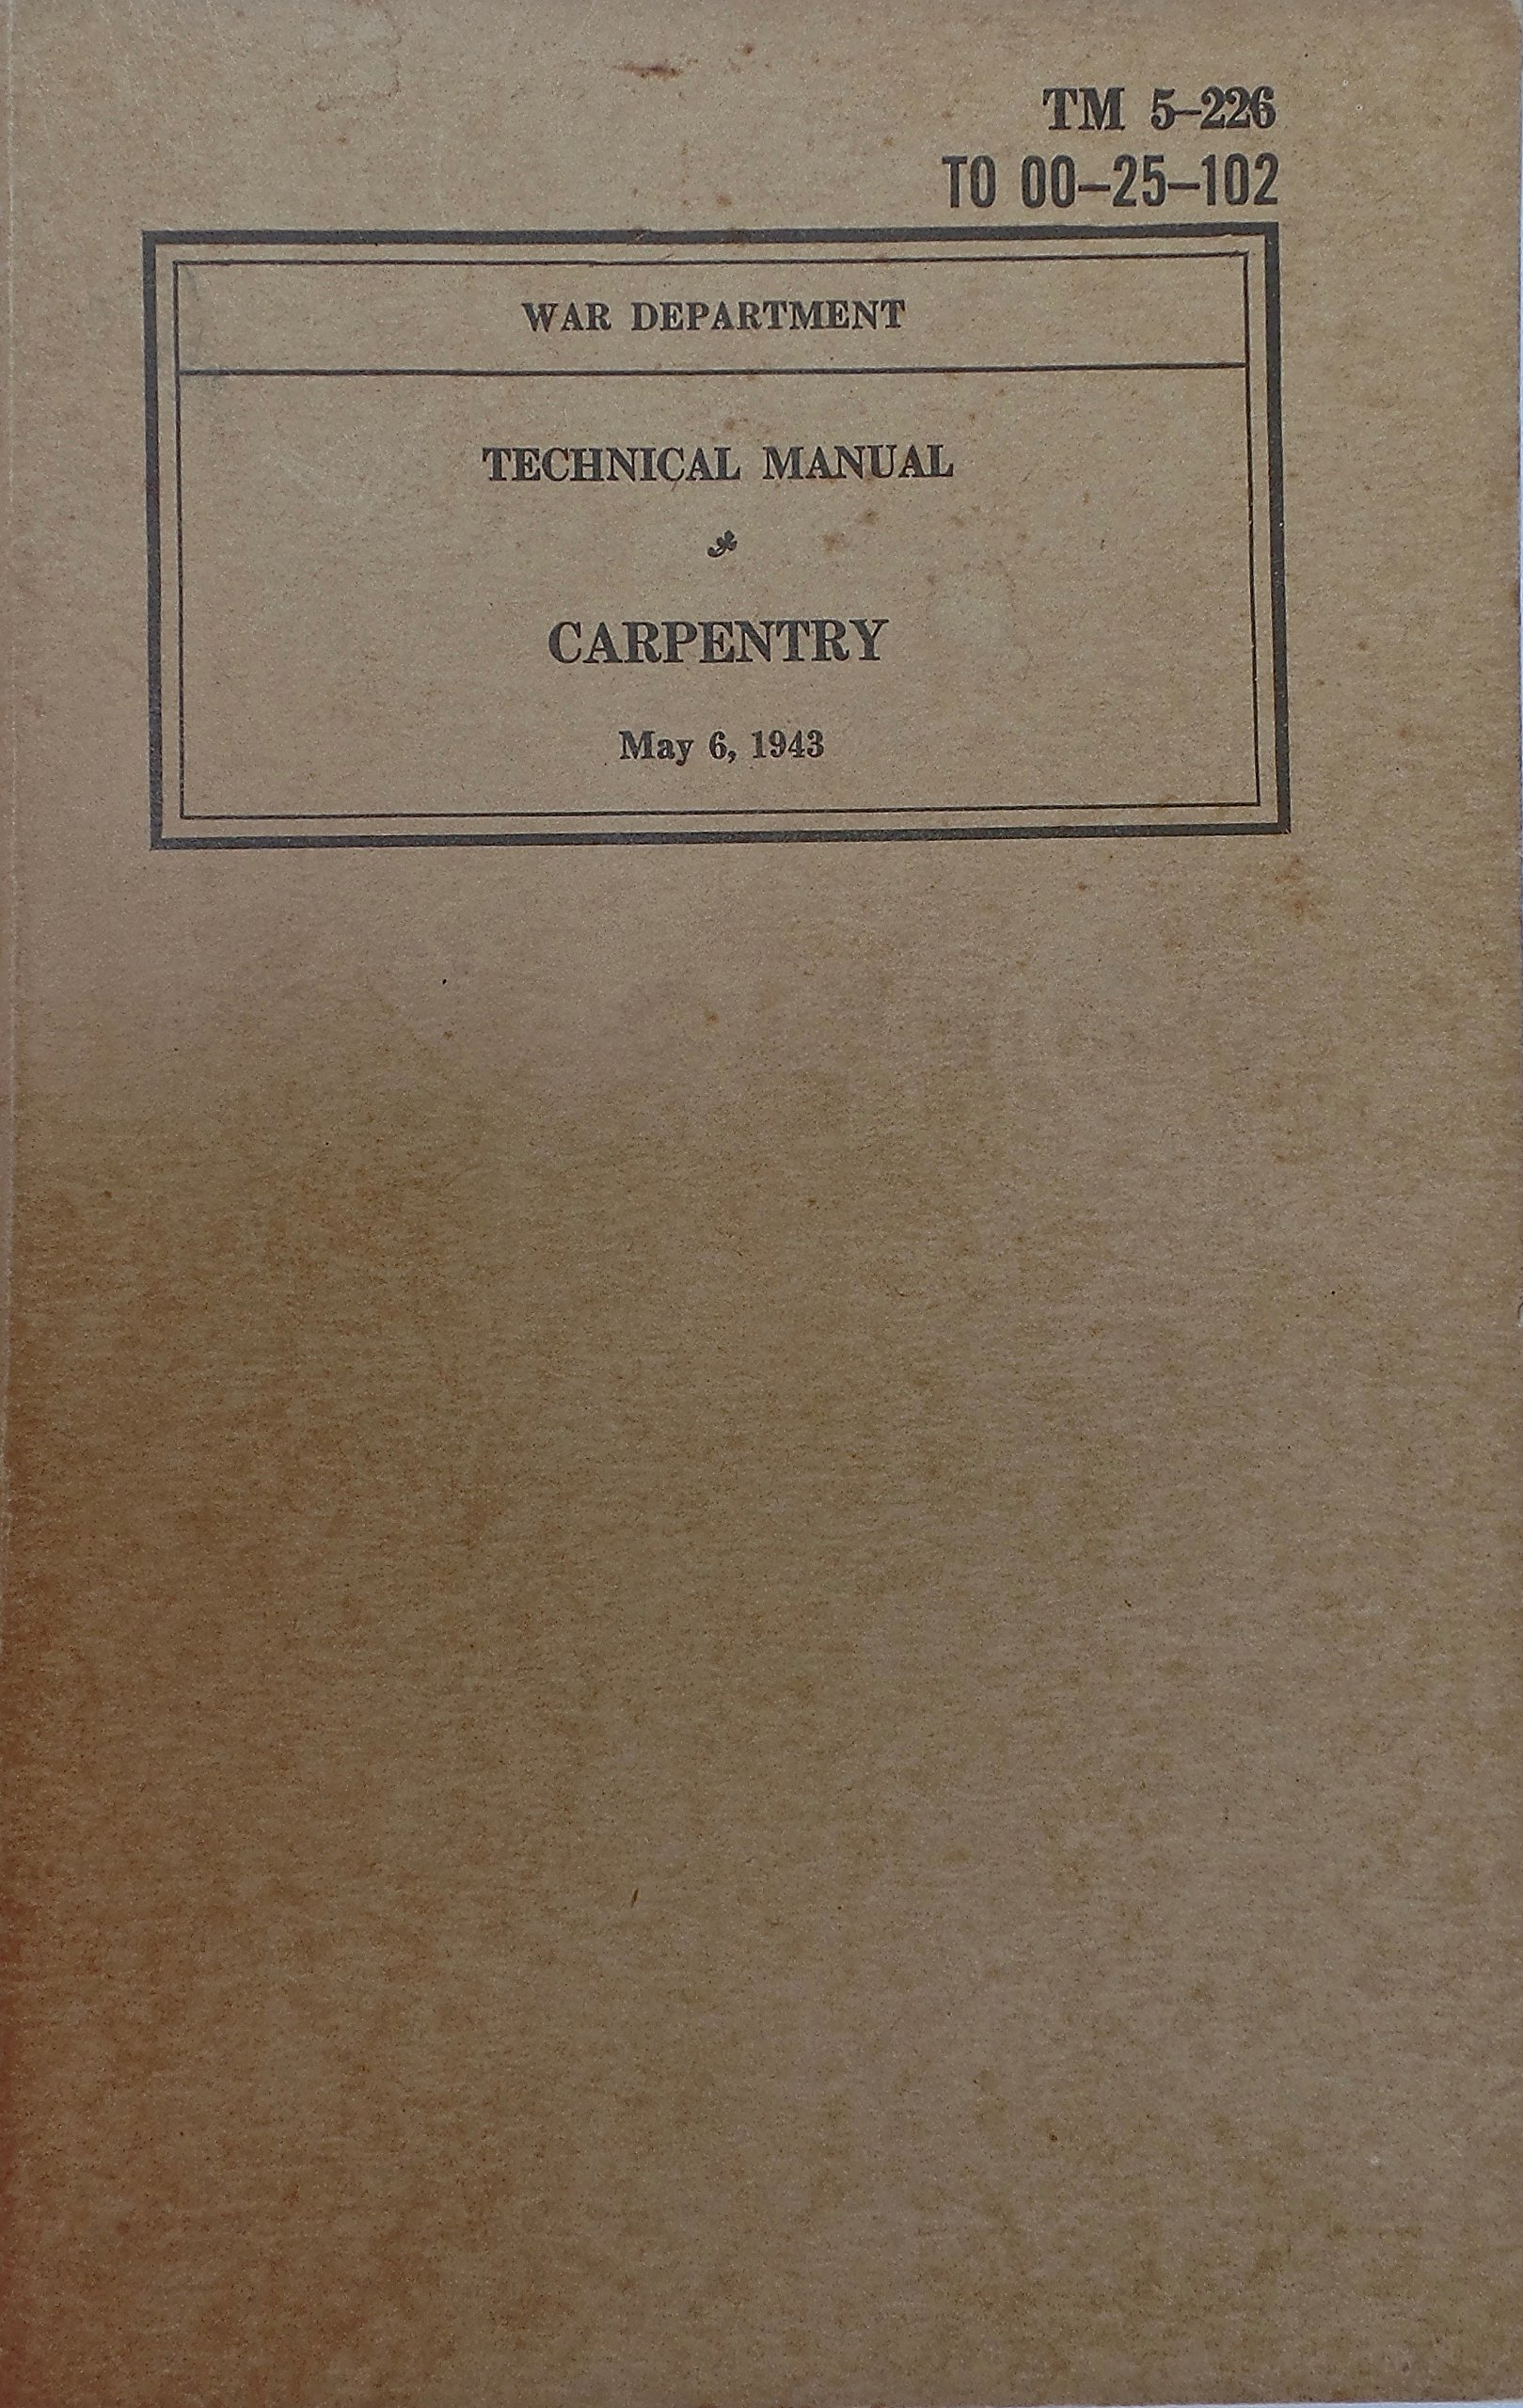 War Department Technical Manual TM 5-226 Carpentry